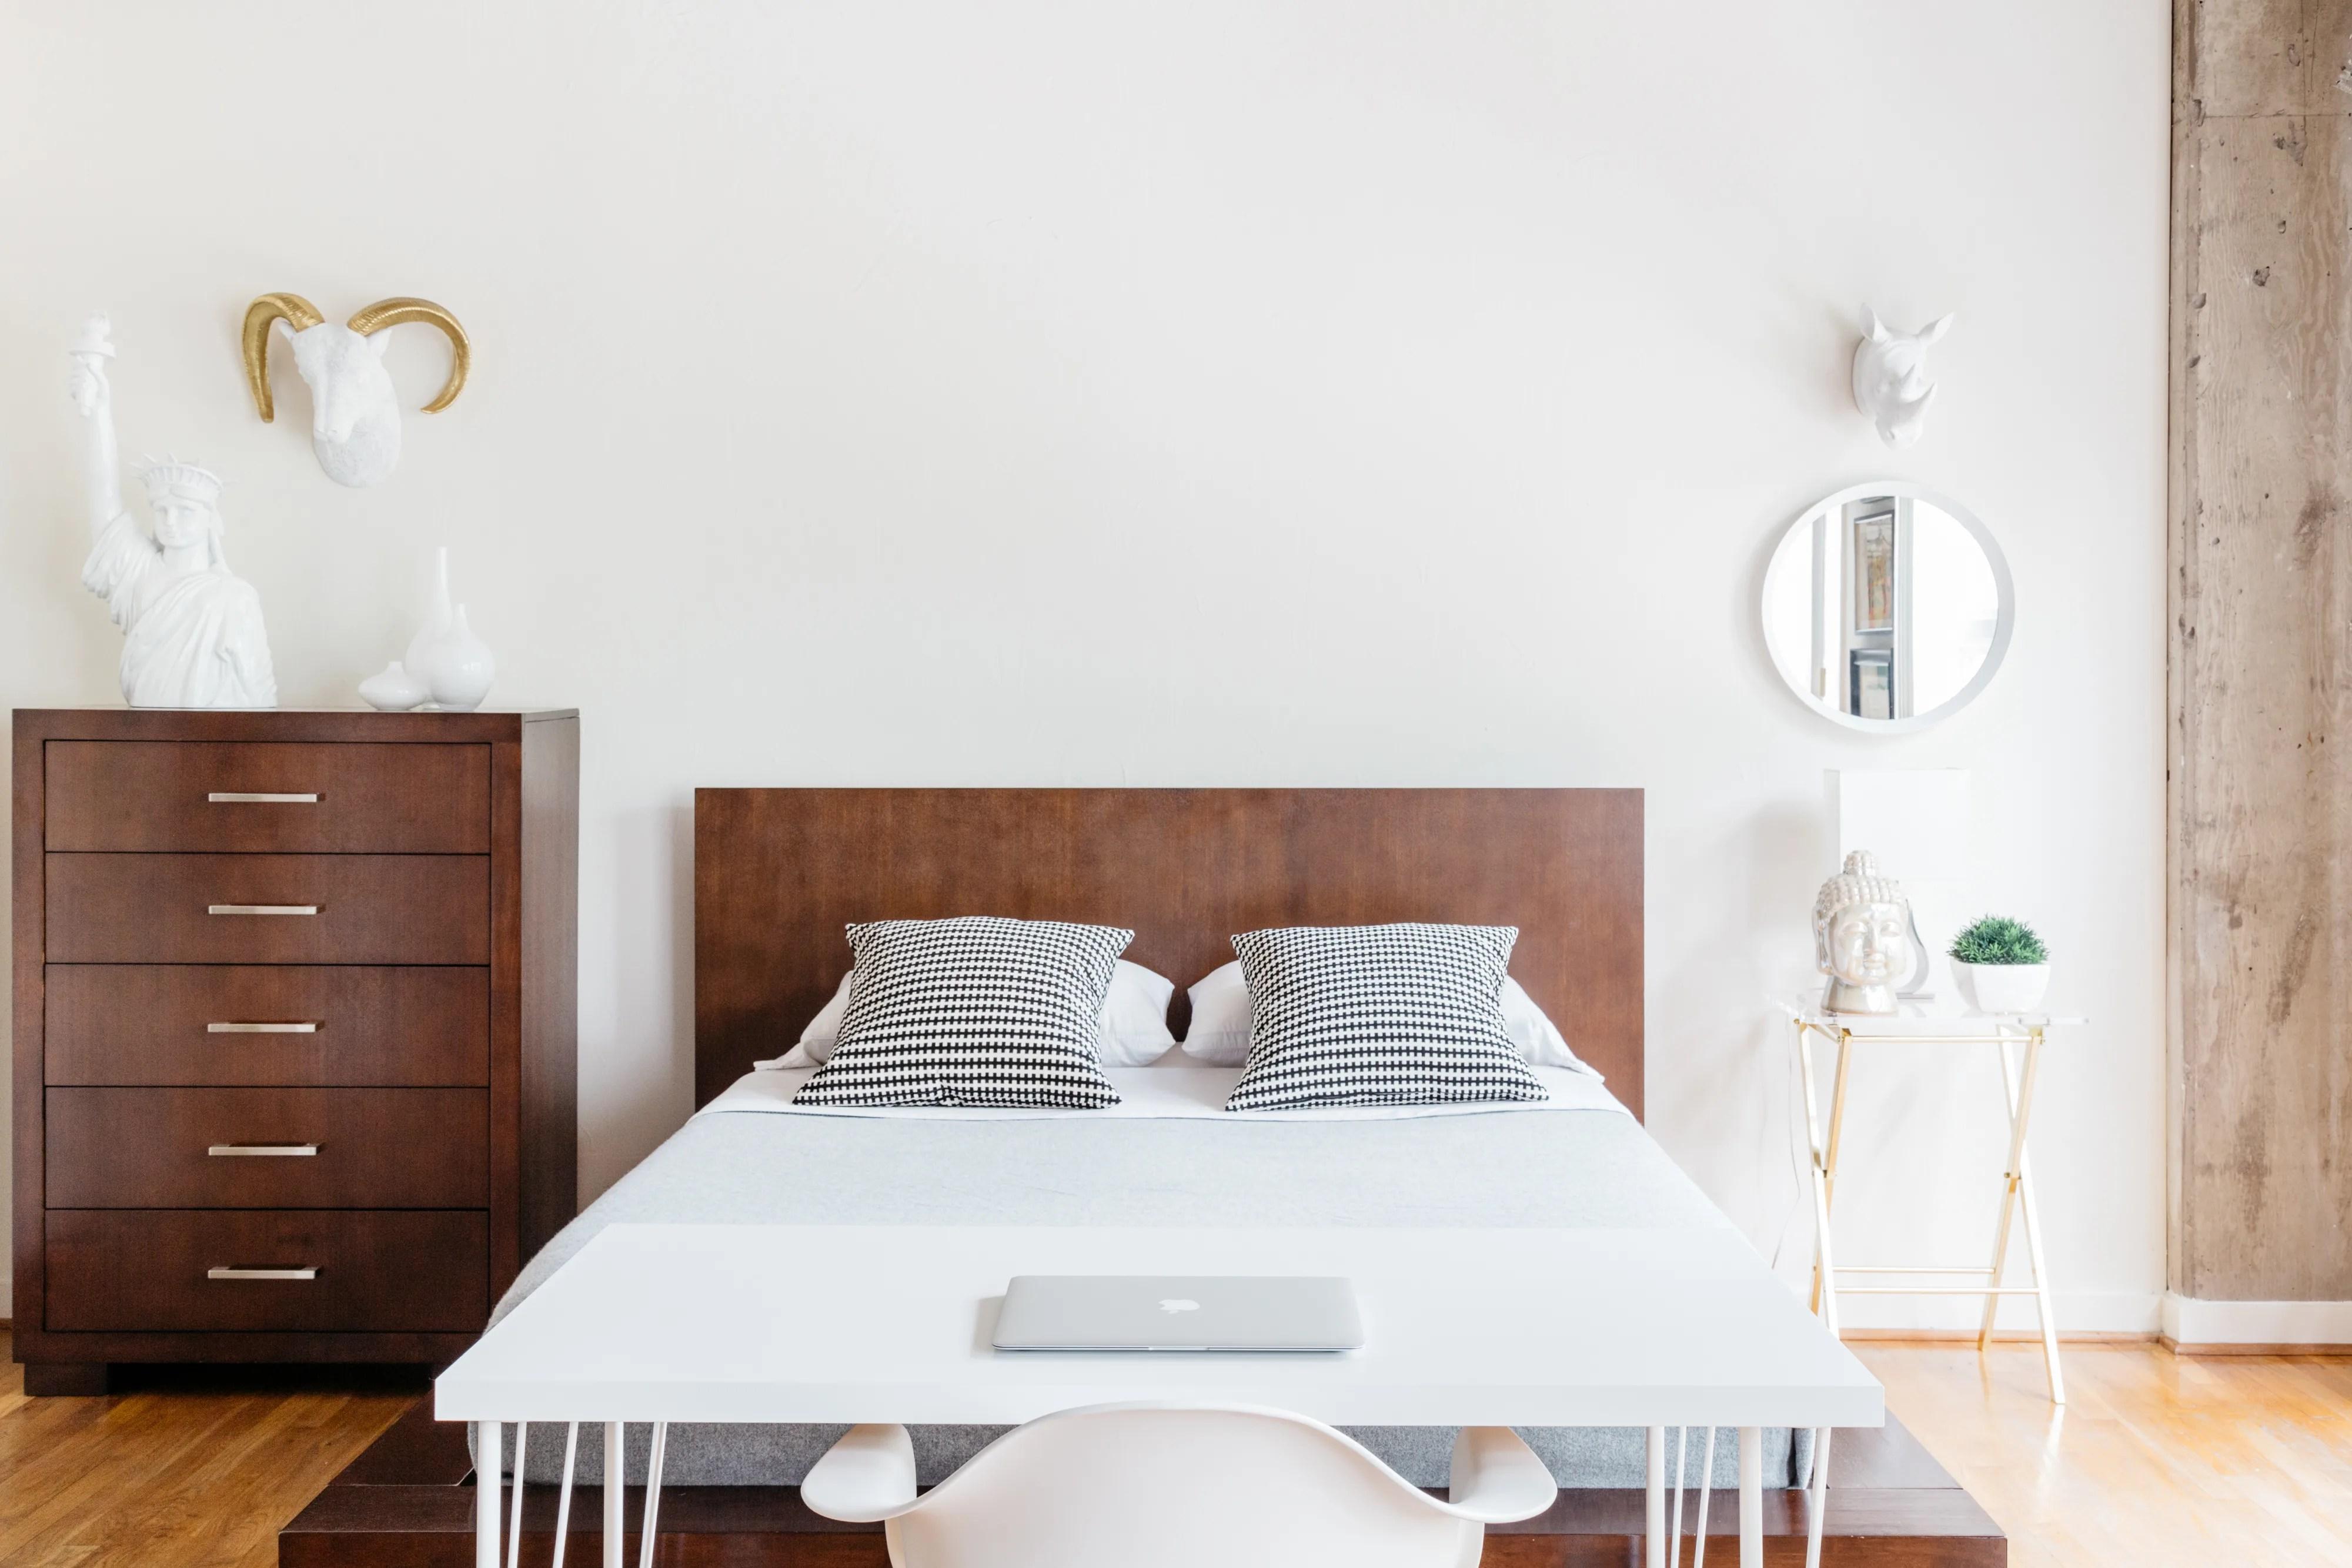 Minimalist Bedroom Ideas (That Aren't Boring) | Apartment ... on Bedroom Minimalist Ideas  id=64314